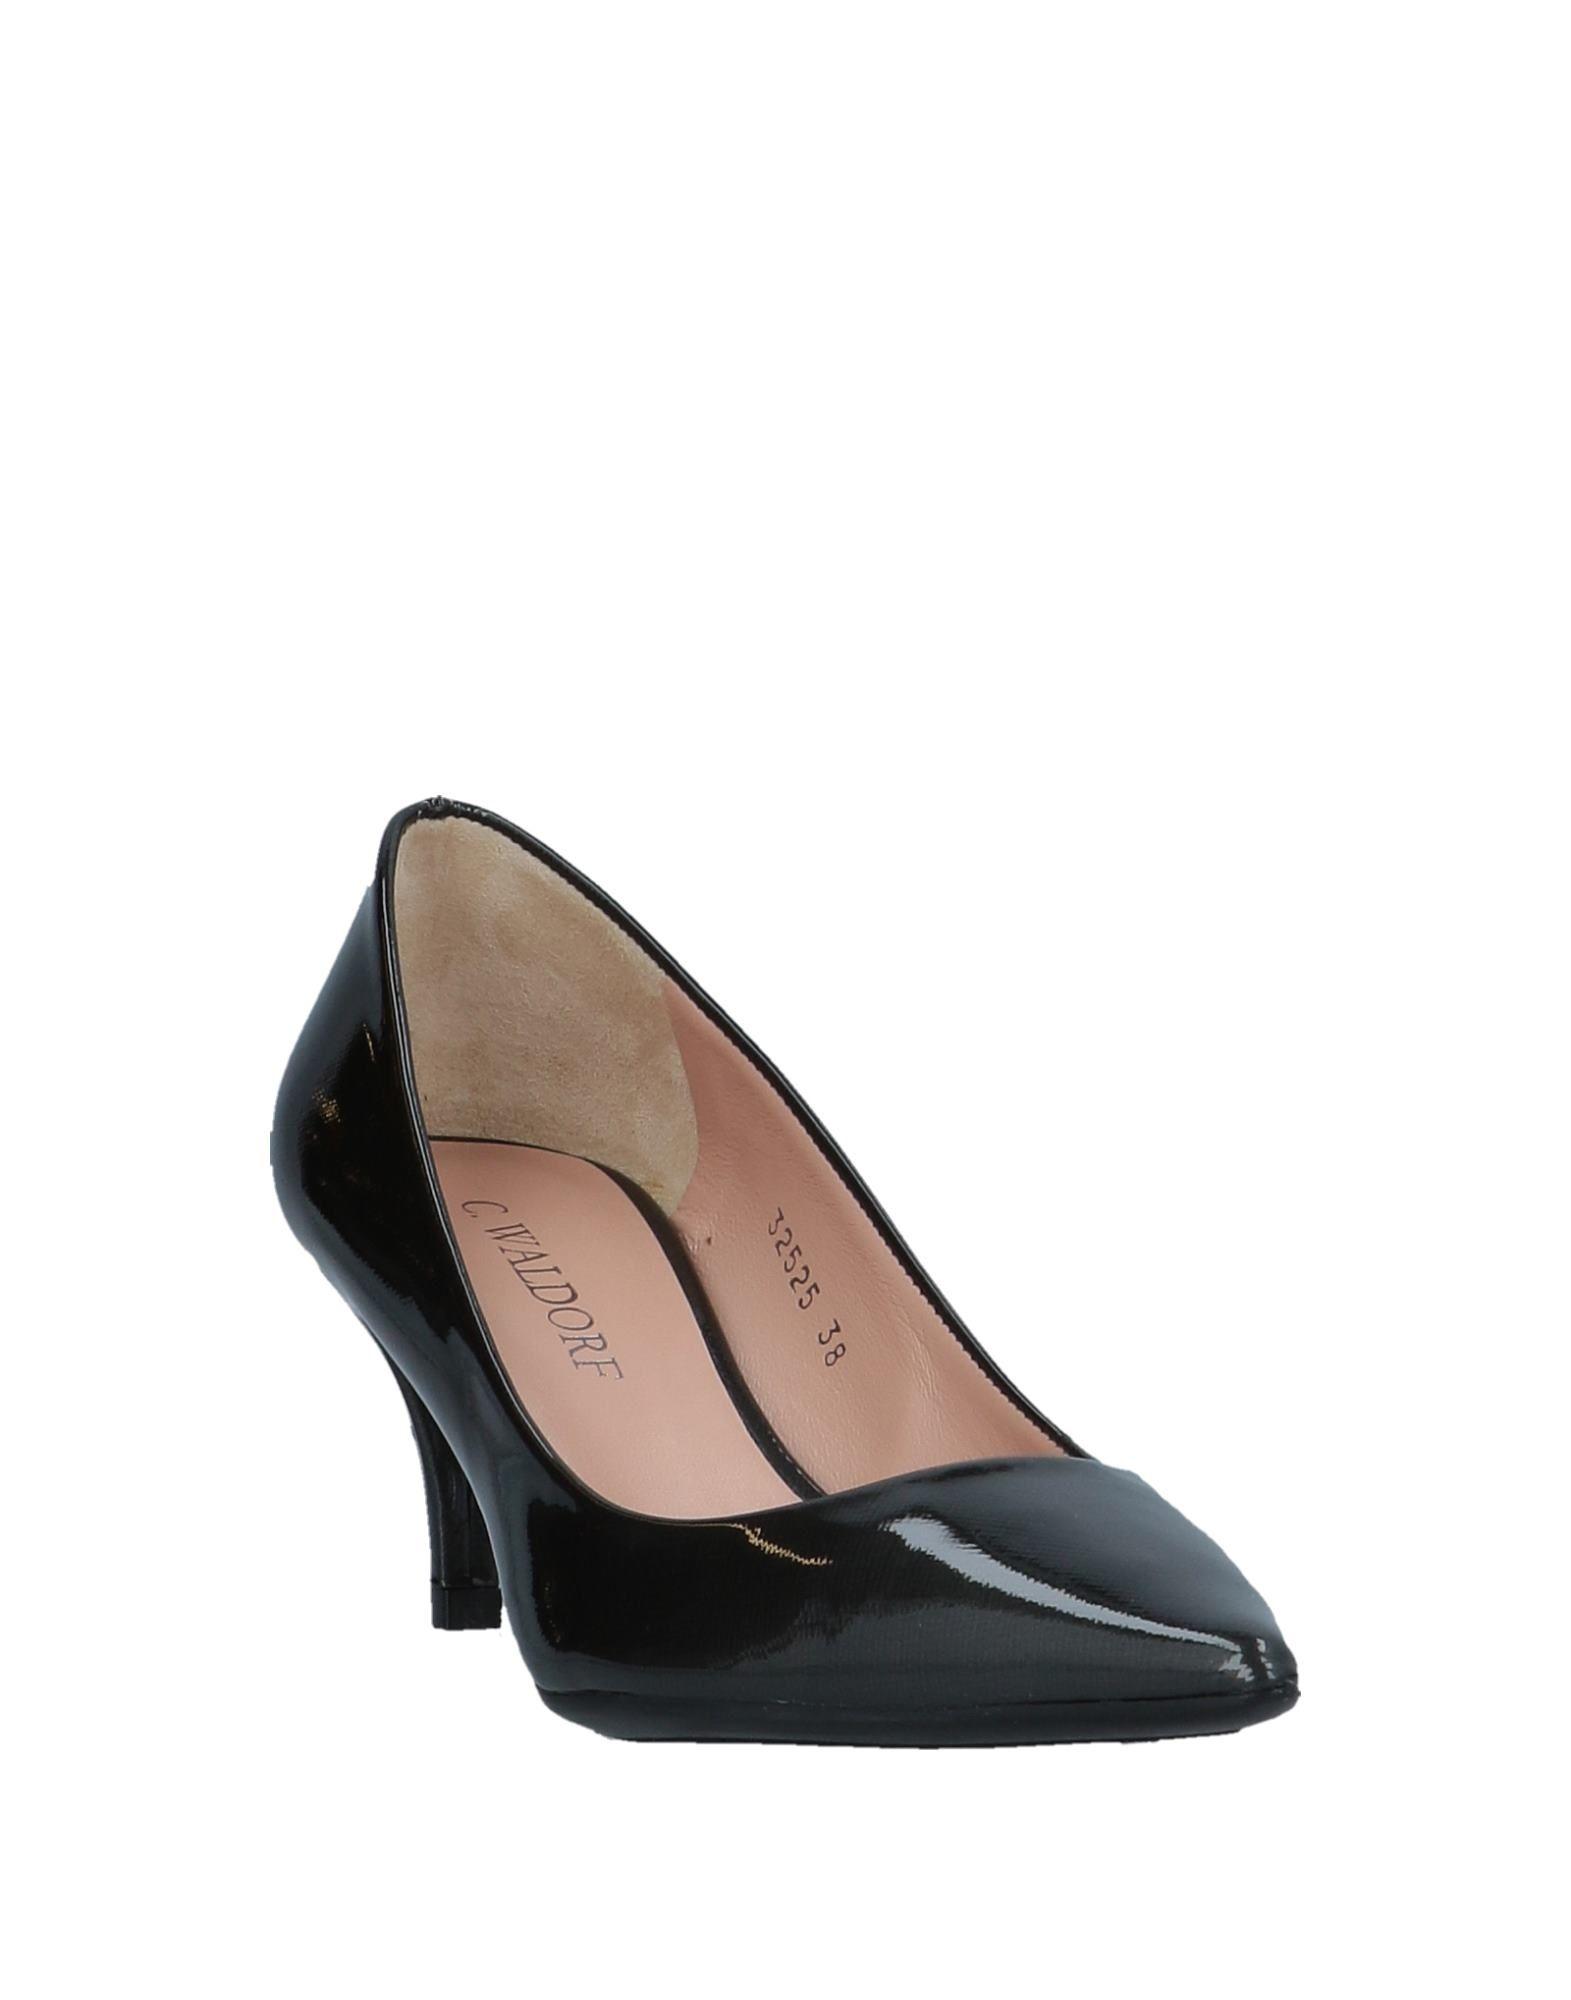 C.Waldorf Gute Pumps Damen  11534175KE Gute C.Waldorf Qualität beliebte Schuhe fa8c85